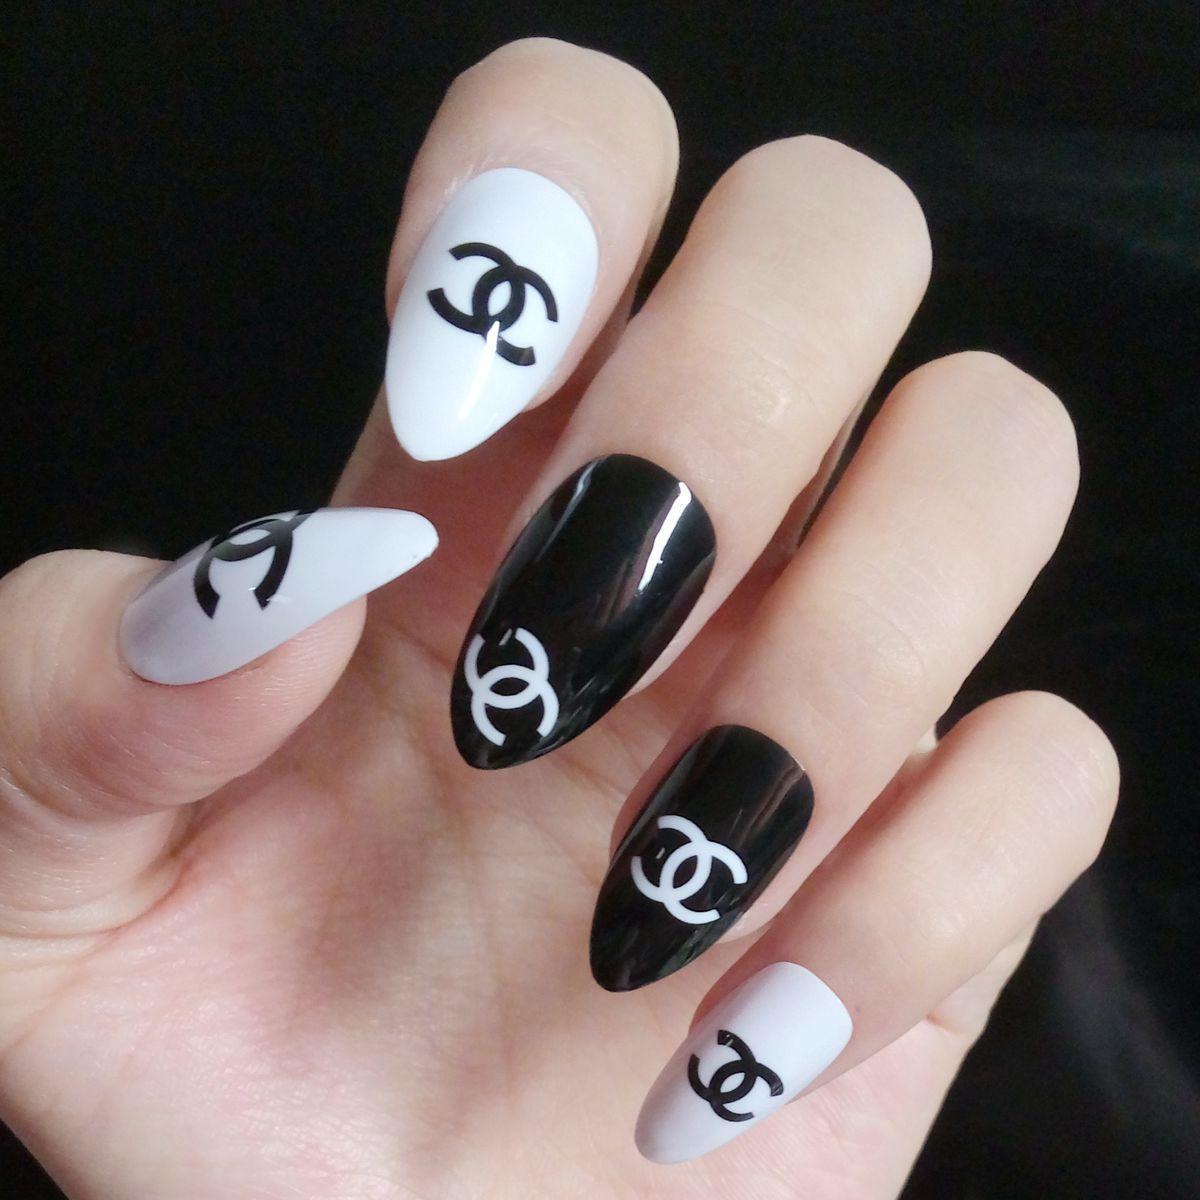 Fashion Design Fake Nail Shiny Black White False Nails Tips Diy Nail Art Manicure Product Full Wrap Tips Z035 Fake Nails French Nails From Pingwang6 96 62 Dhgate Com